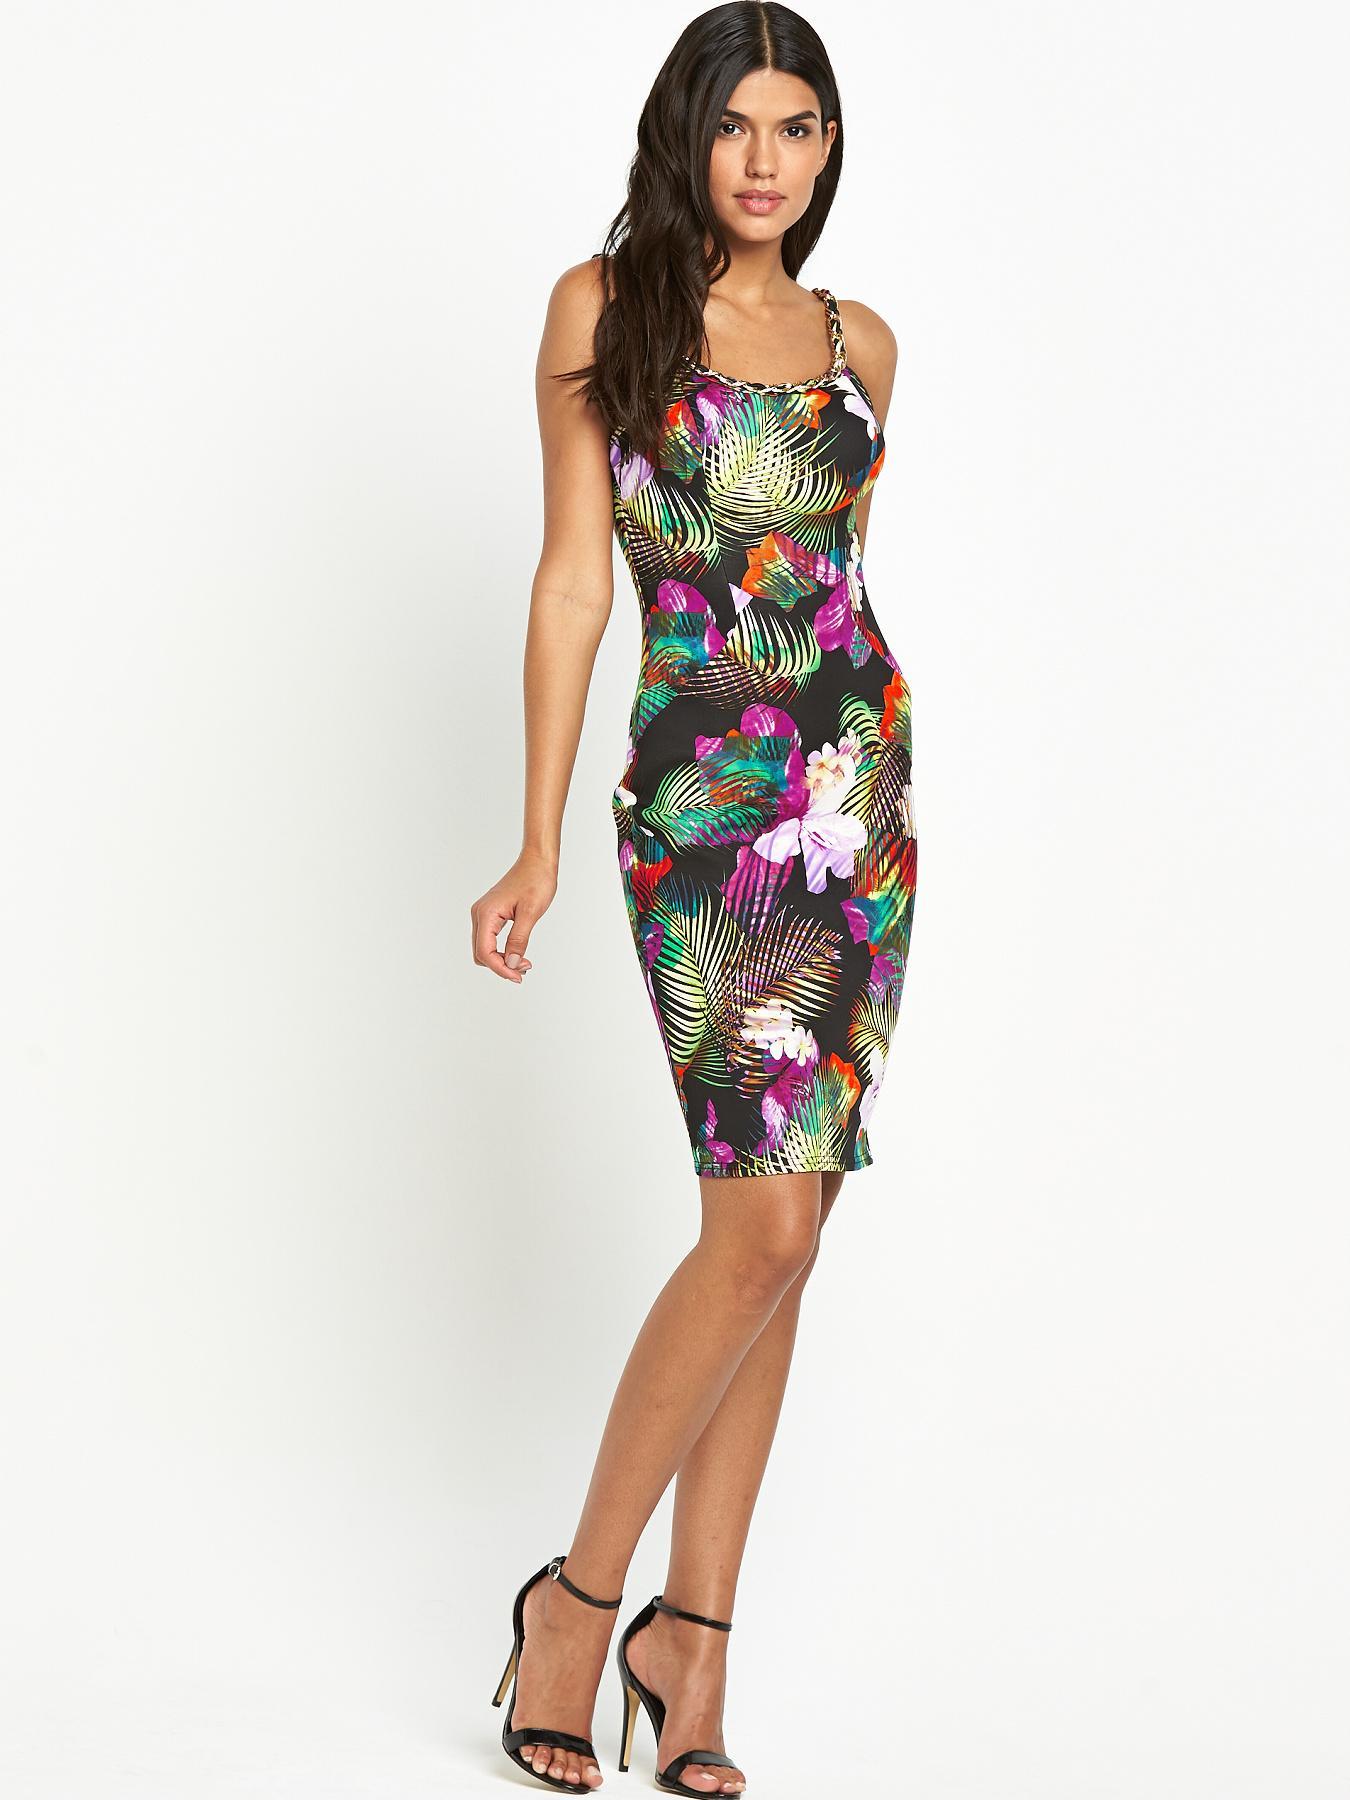 Notting Hill Dress